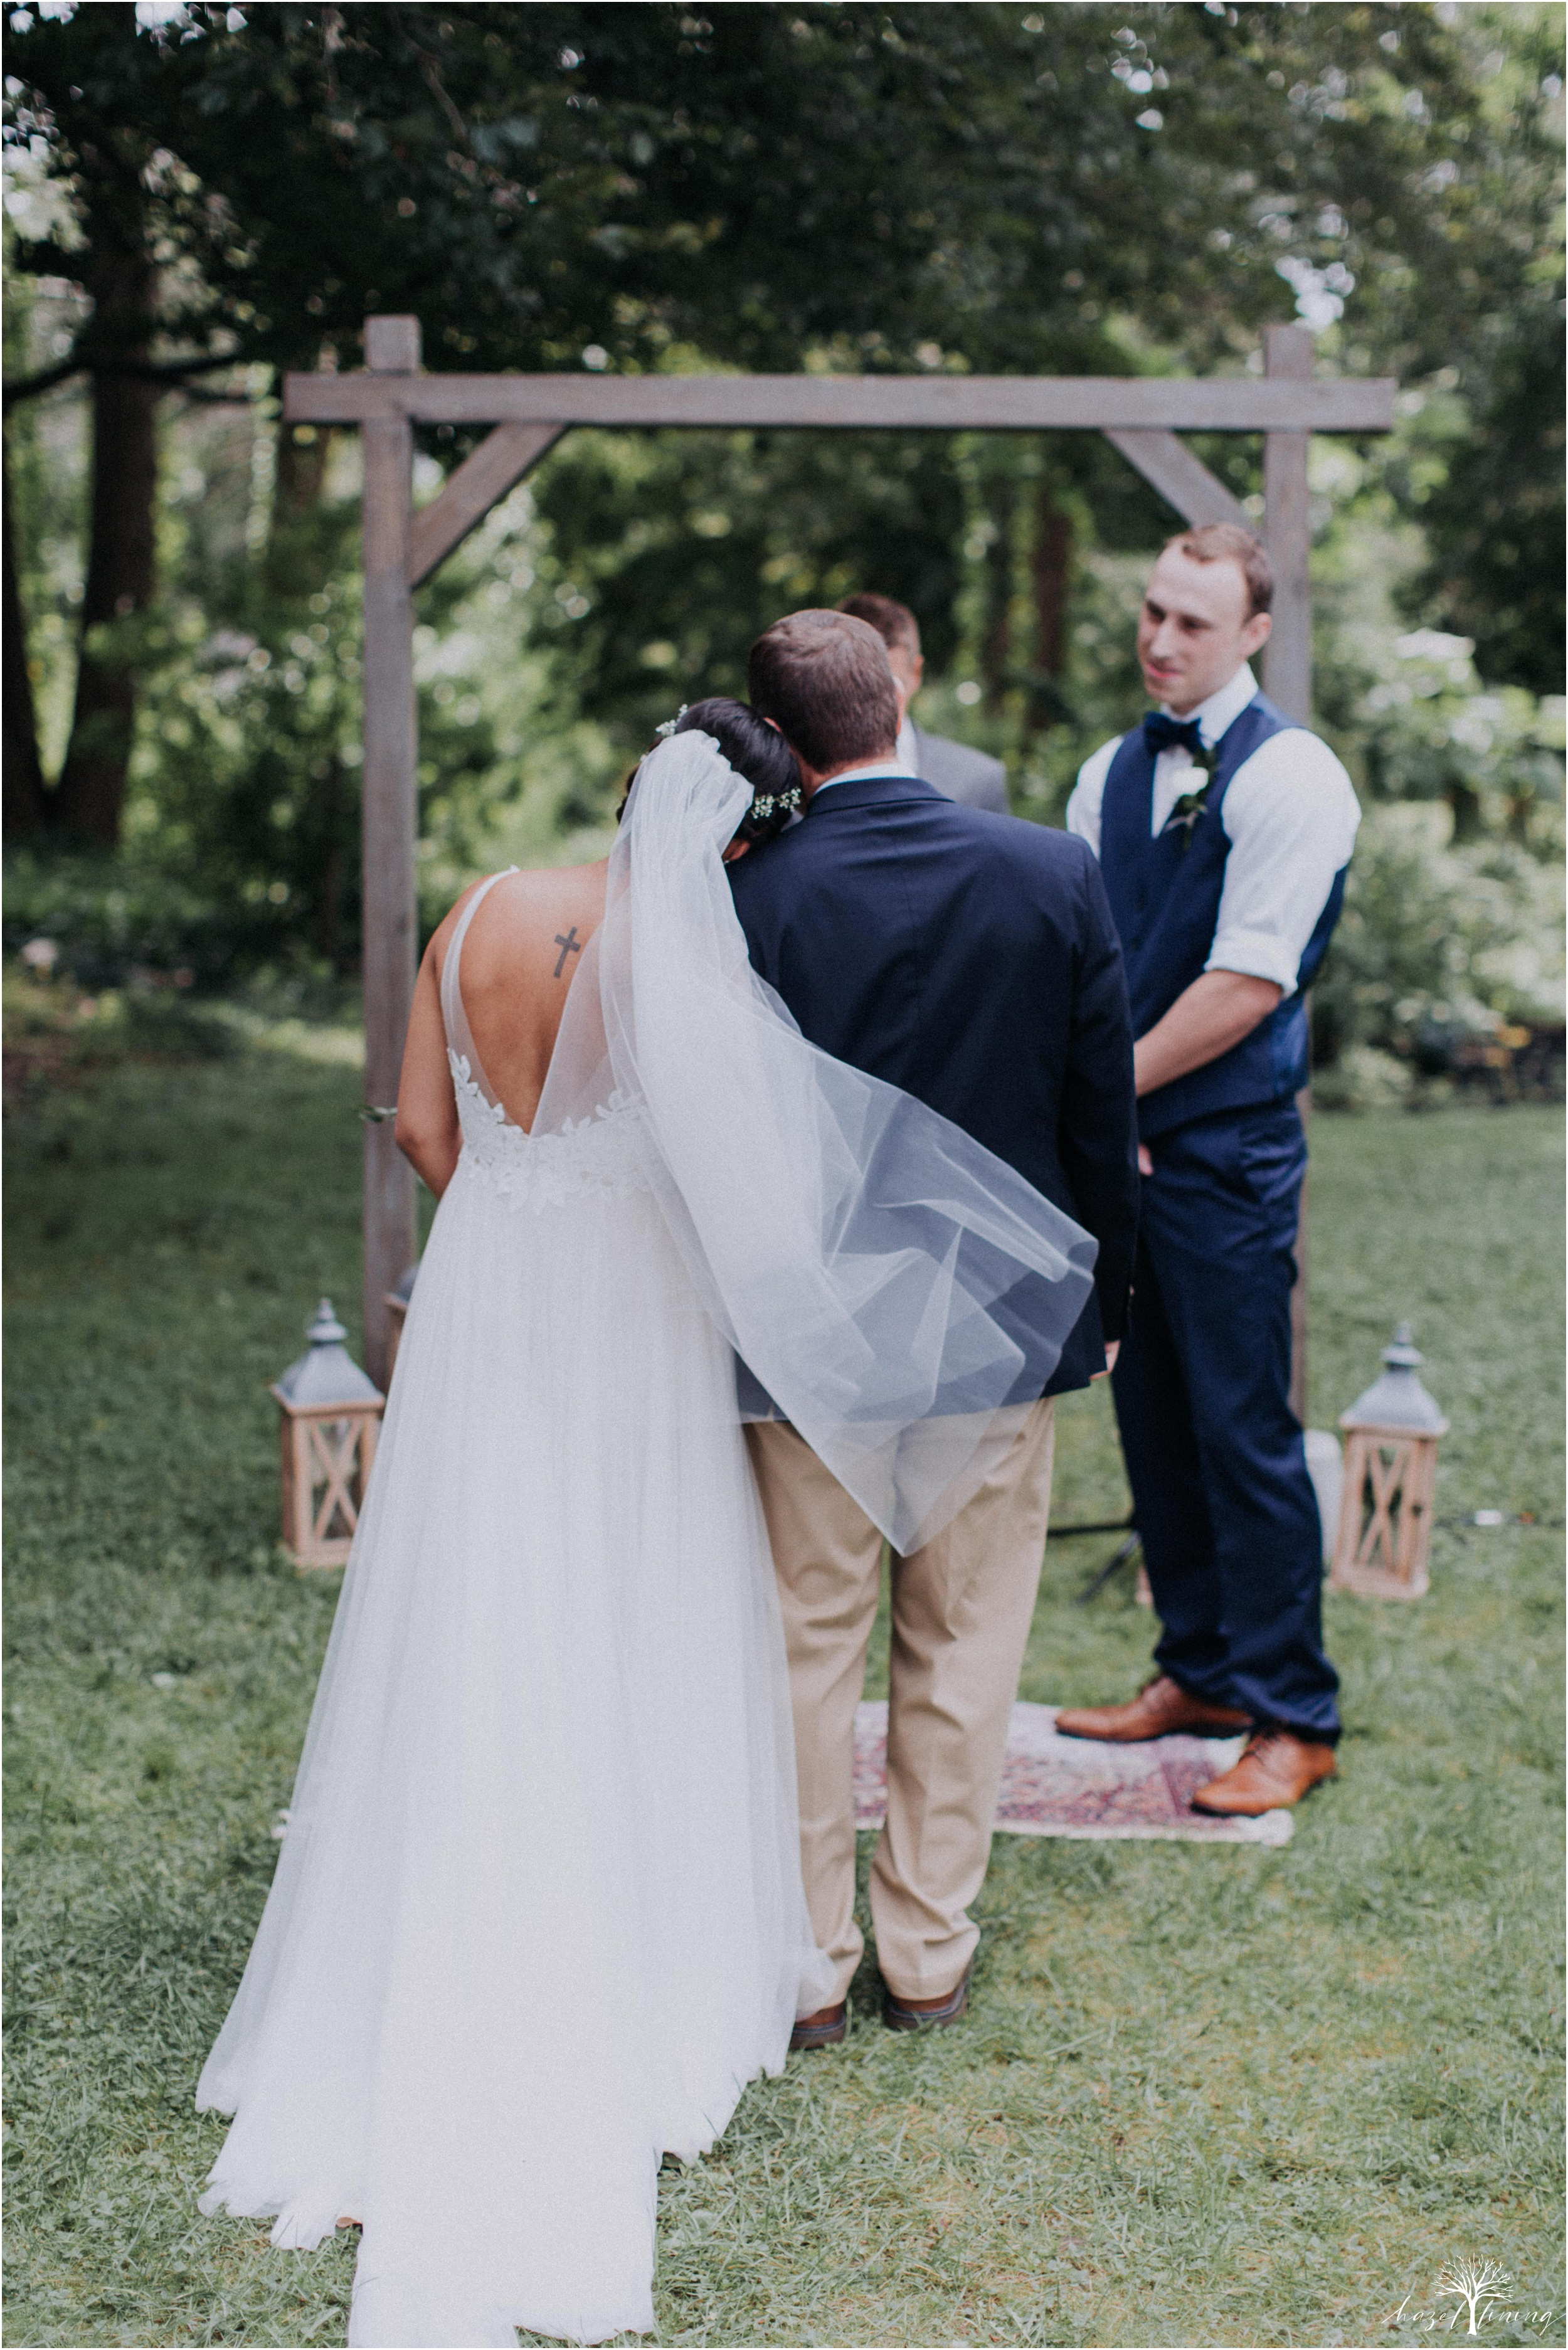 mariah-kreyling-samuel-sherratt-sherrattwiththeworld-peirce-farm-at-witch-hill-boston-massachusetts-wedding-photography-hazel-lining-travel-wedding-elopement-photography_0080.jpg